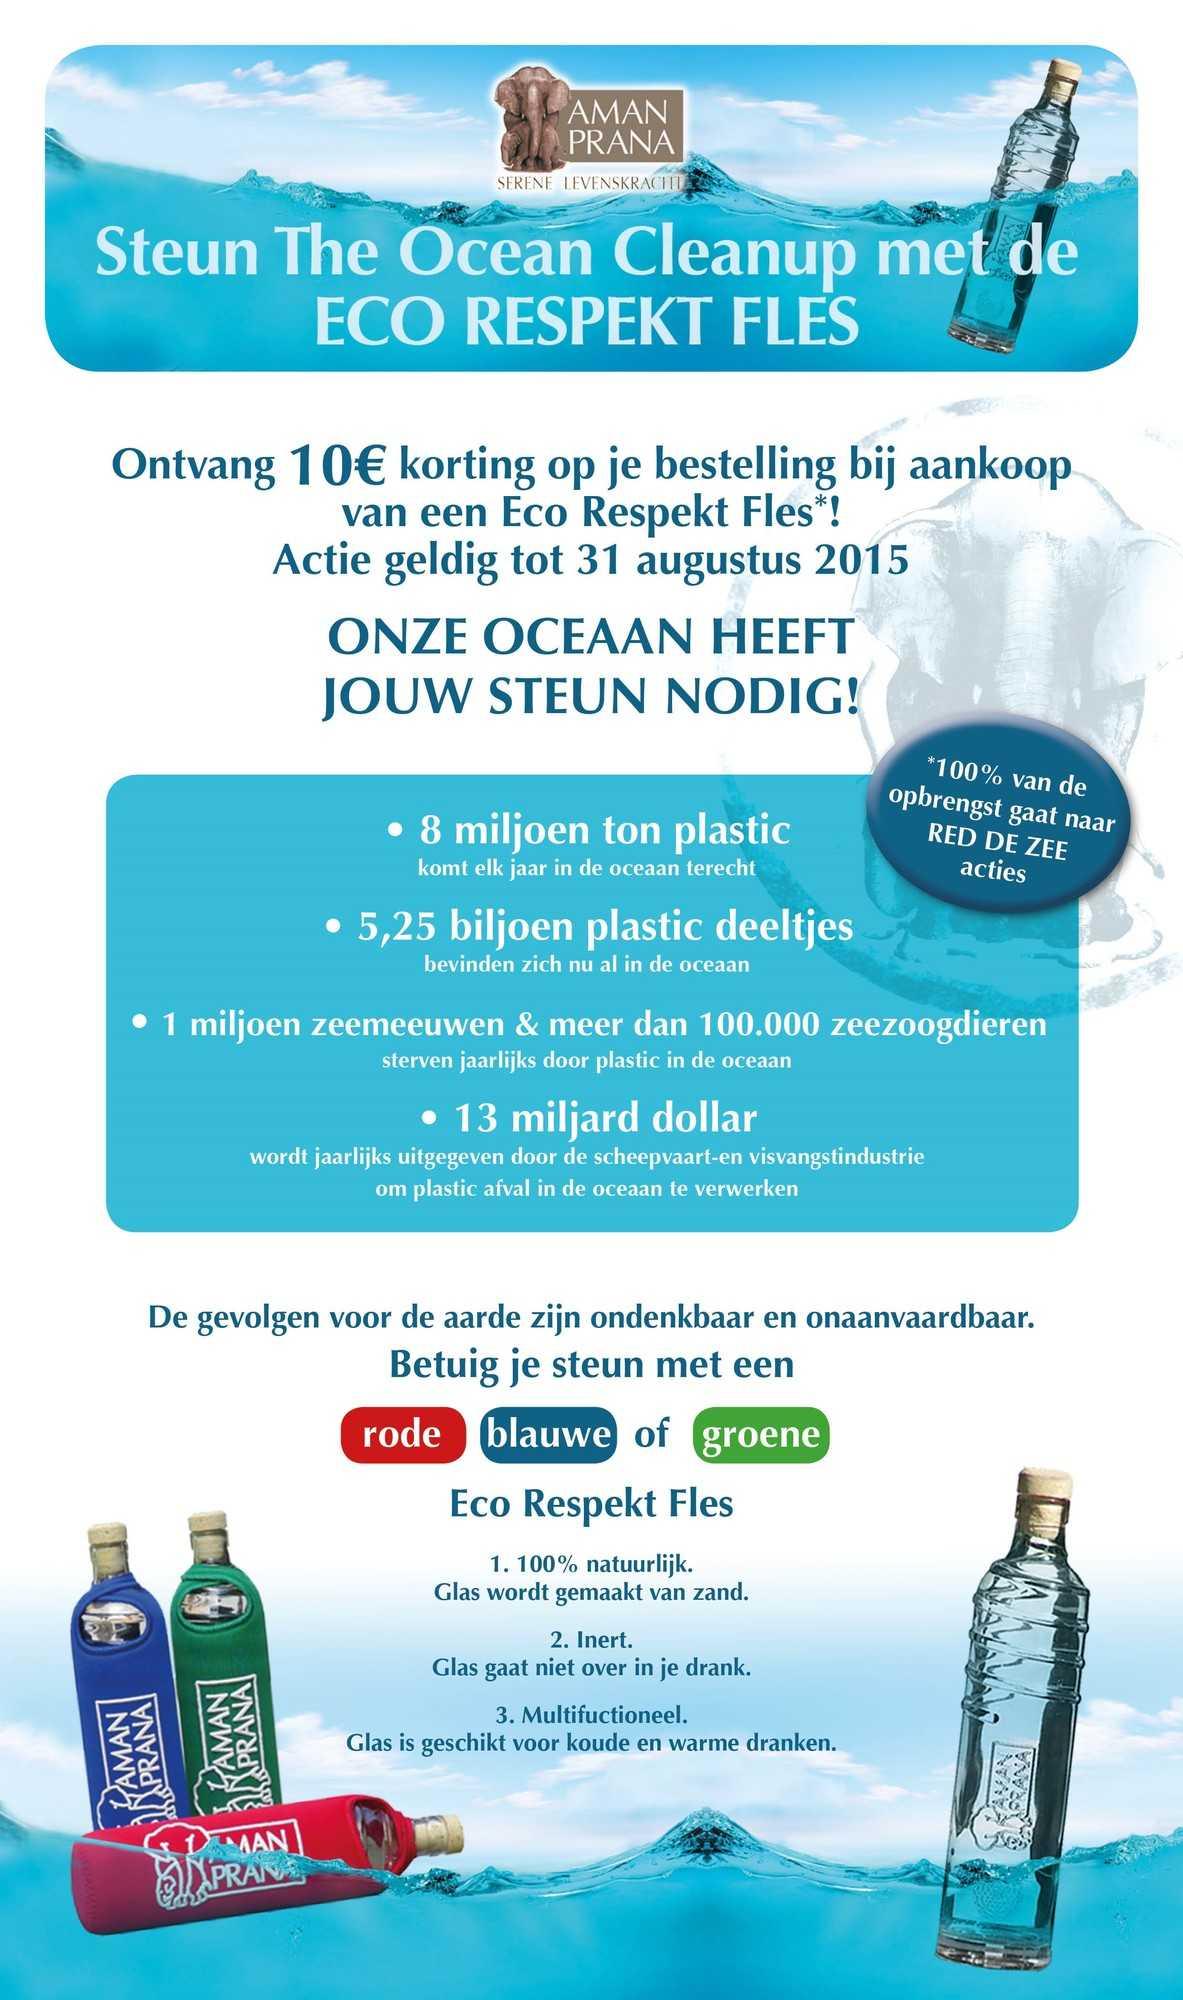 Actie Eco Respekt Fles Amanprana - Steun de Ocean Cleanup